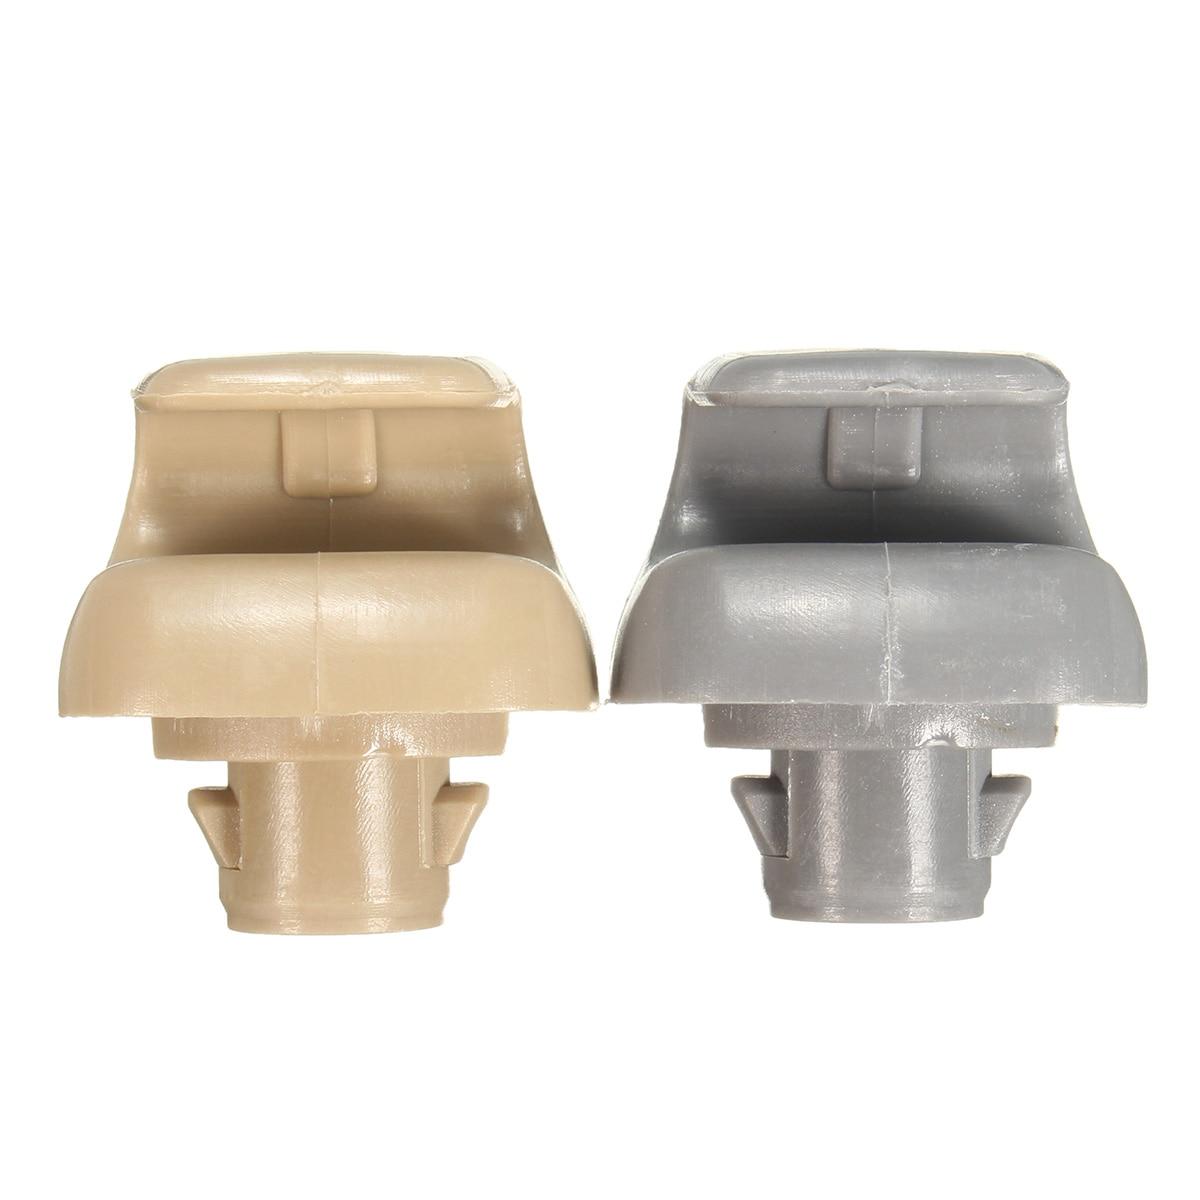 Автомобиль Защита от солнца козырек зажим для Honda/cr-v/CIVIC/ACCORD/Odyssey 1999- 2011 88217-s04-003za